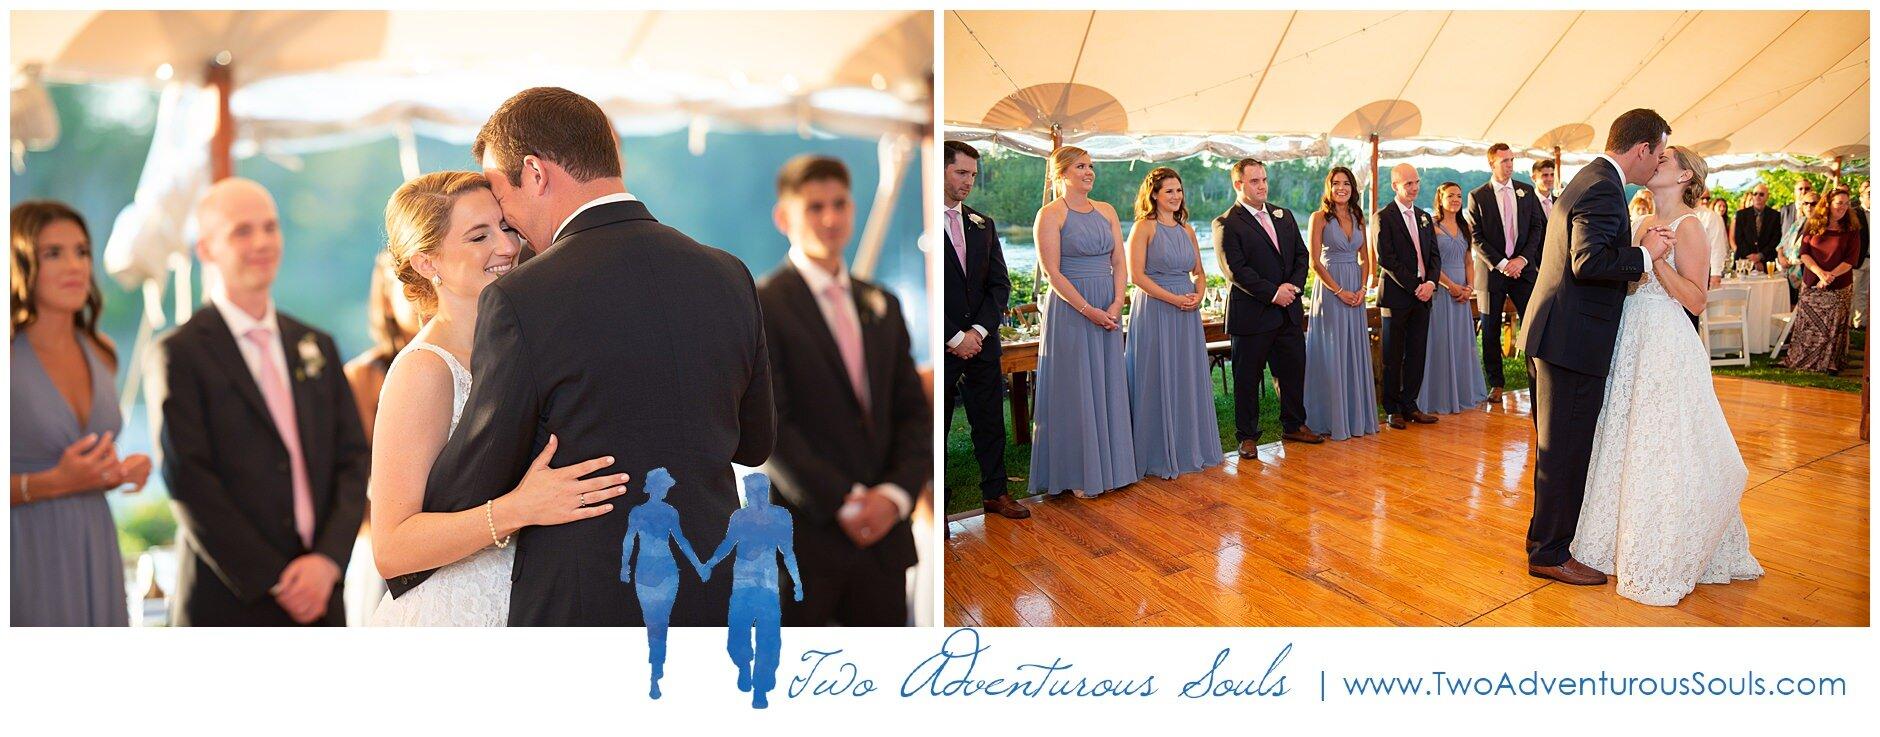 Breakwater Inn and Spa Wedding Photographers, Kennebunkport Wedding Photographers, Two Adventurous Souls- 092119_0046.jpg